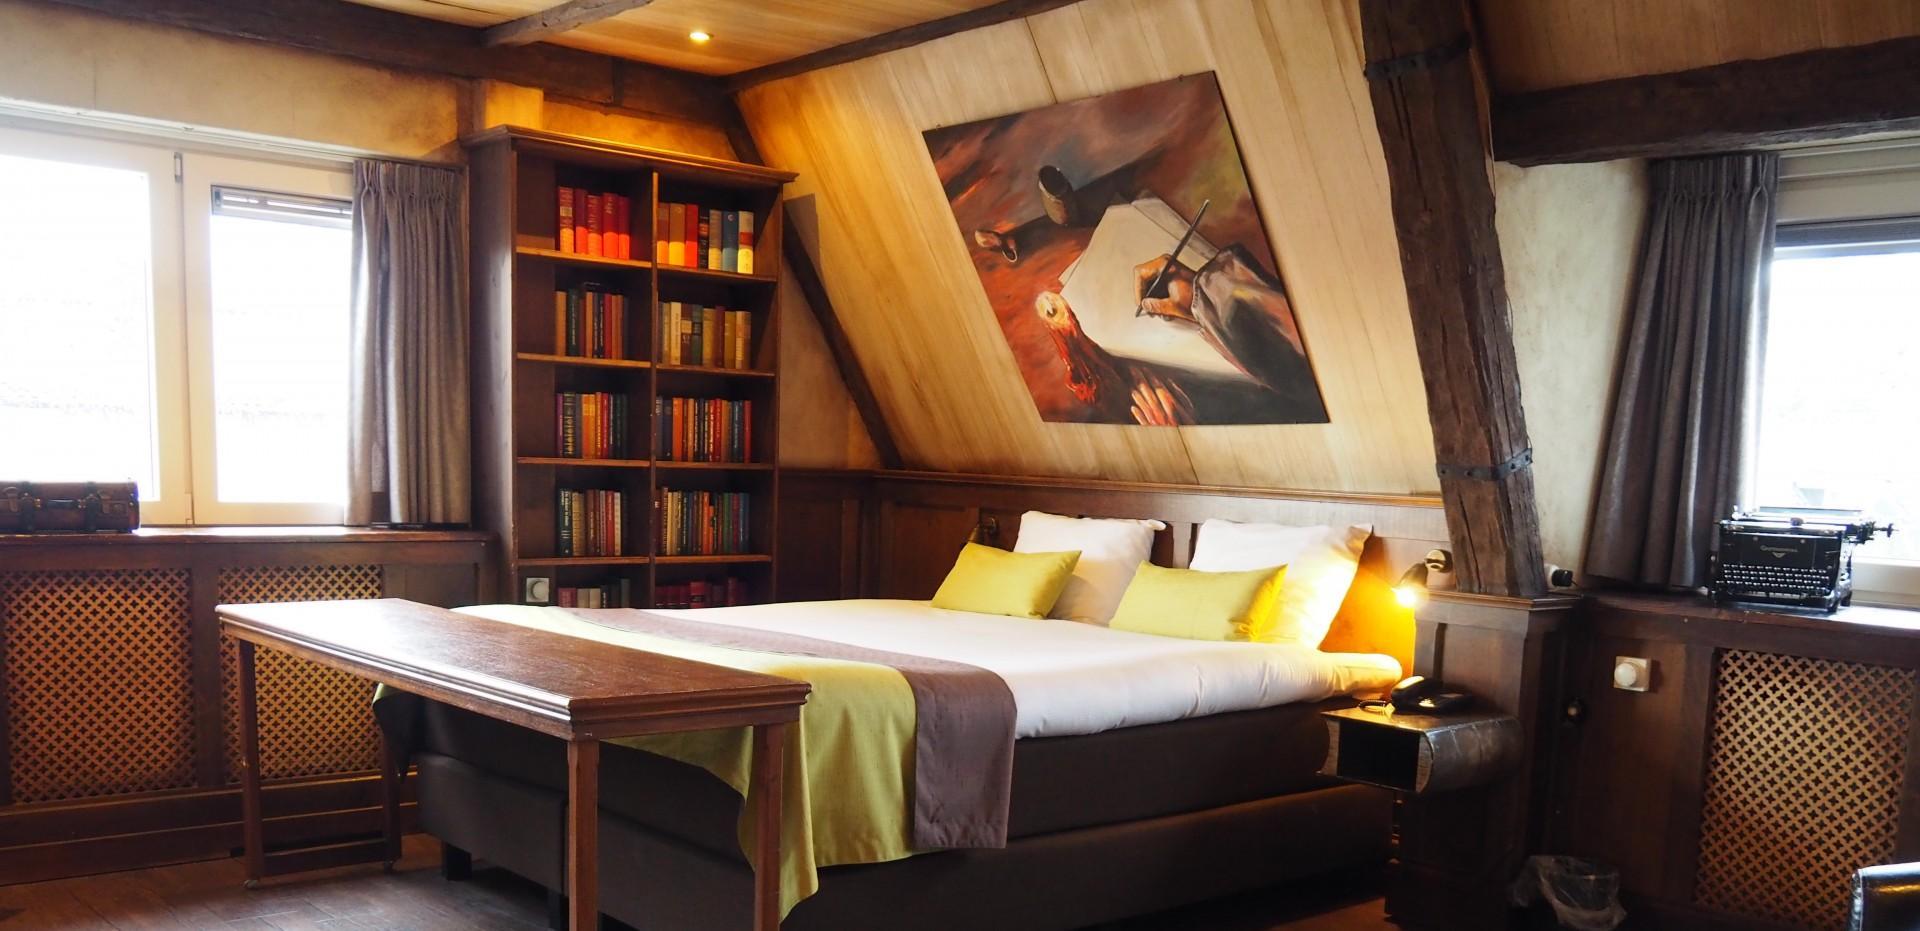 Hotel | Restaurant | Wellness | Lounge | Terras | Vergaderen | Feesten